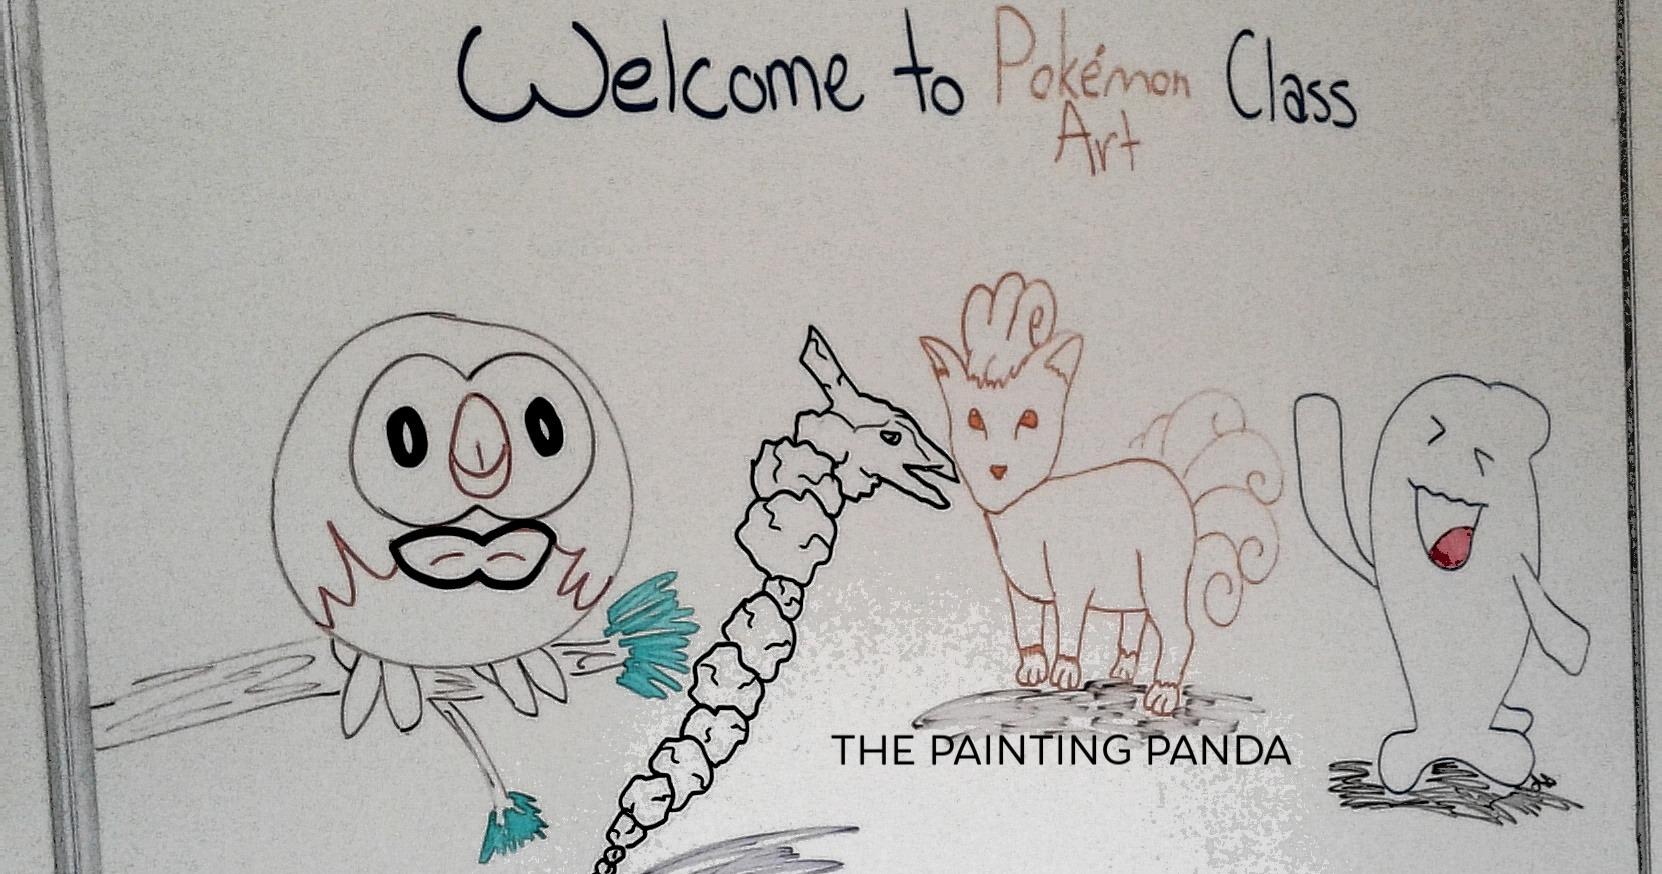 The Painting Panda Classroom Pokemon Drawing Subscription Class